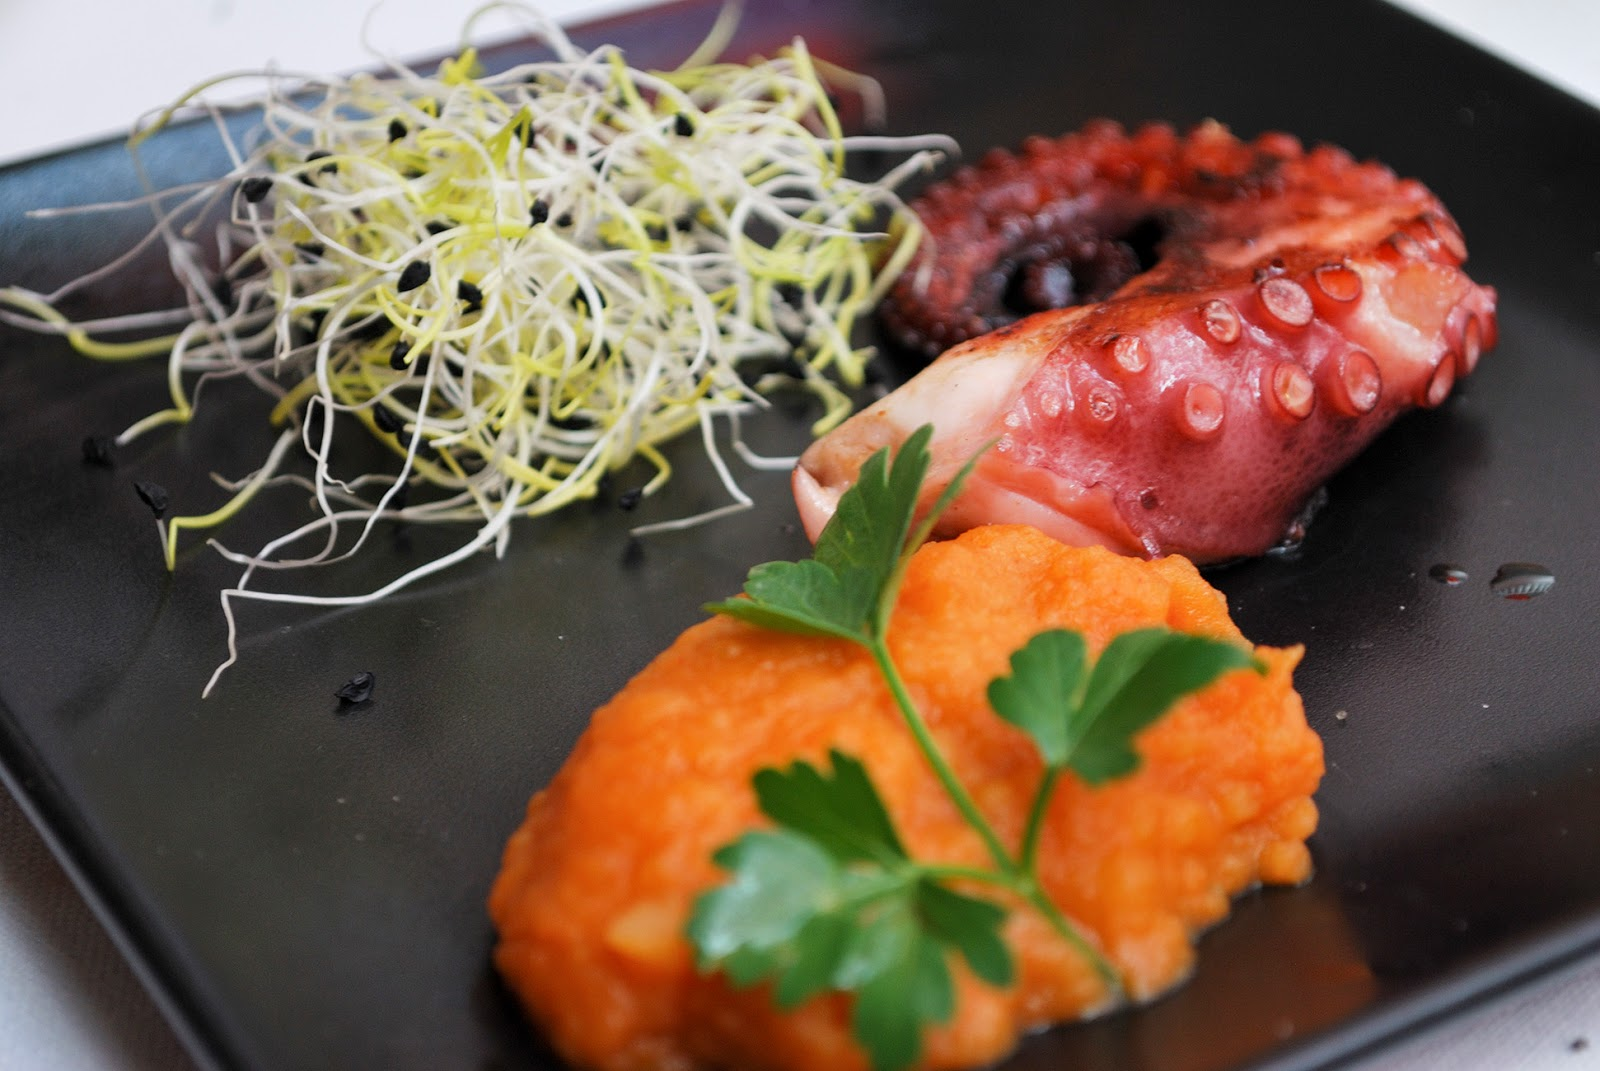 restaurante zacarias menu degustacion santander cantabria